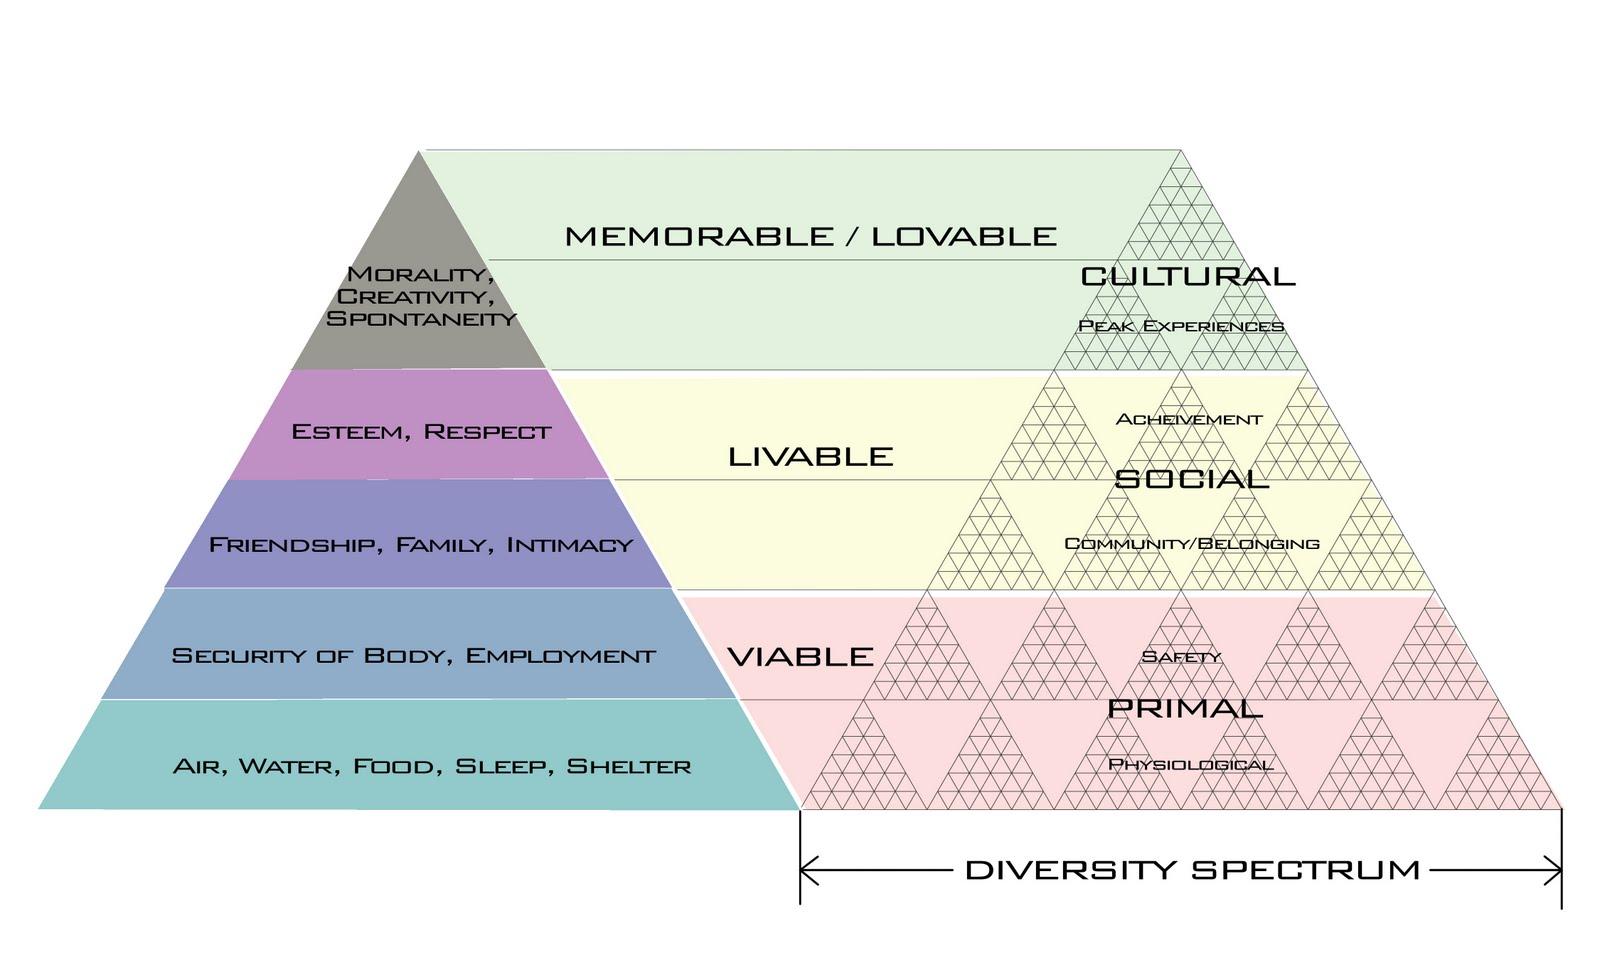 http://2.bp.blogspot.com/_D5kx0bUGx_c/S_v4YDHga8I/AAAAAAAACfc/lLwt_qvXz5Q/s1600/city+pyramid+-+hierarchy+-+diversity.jpg